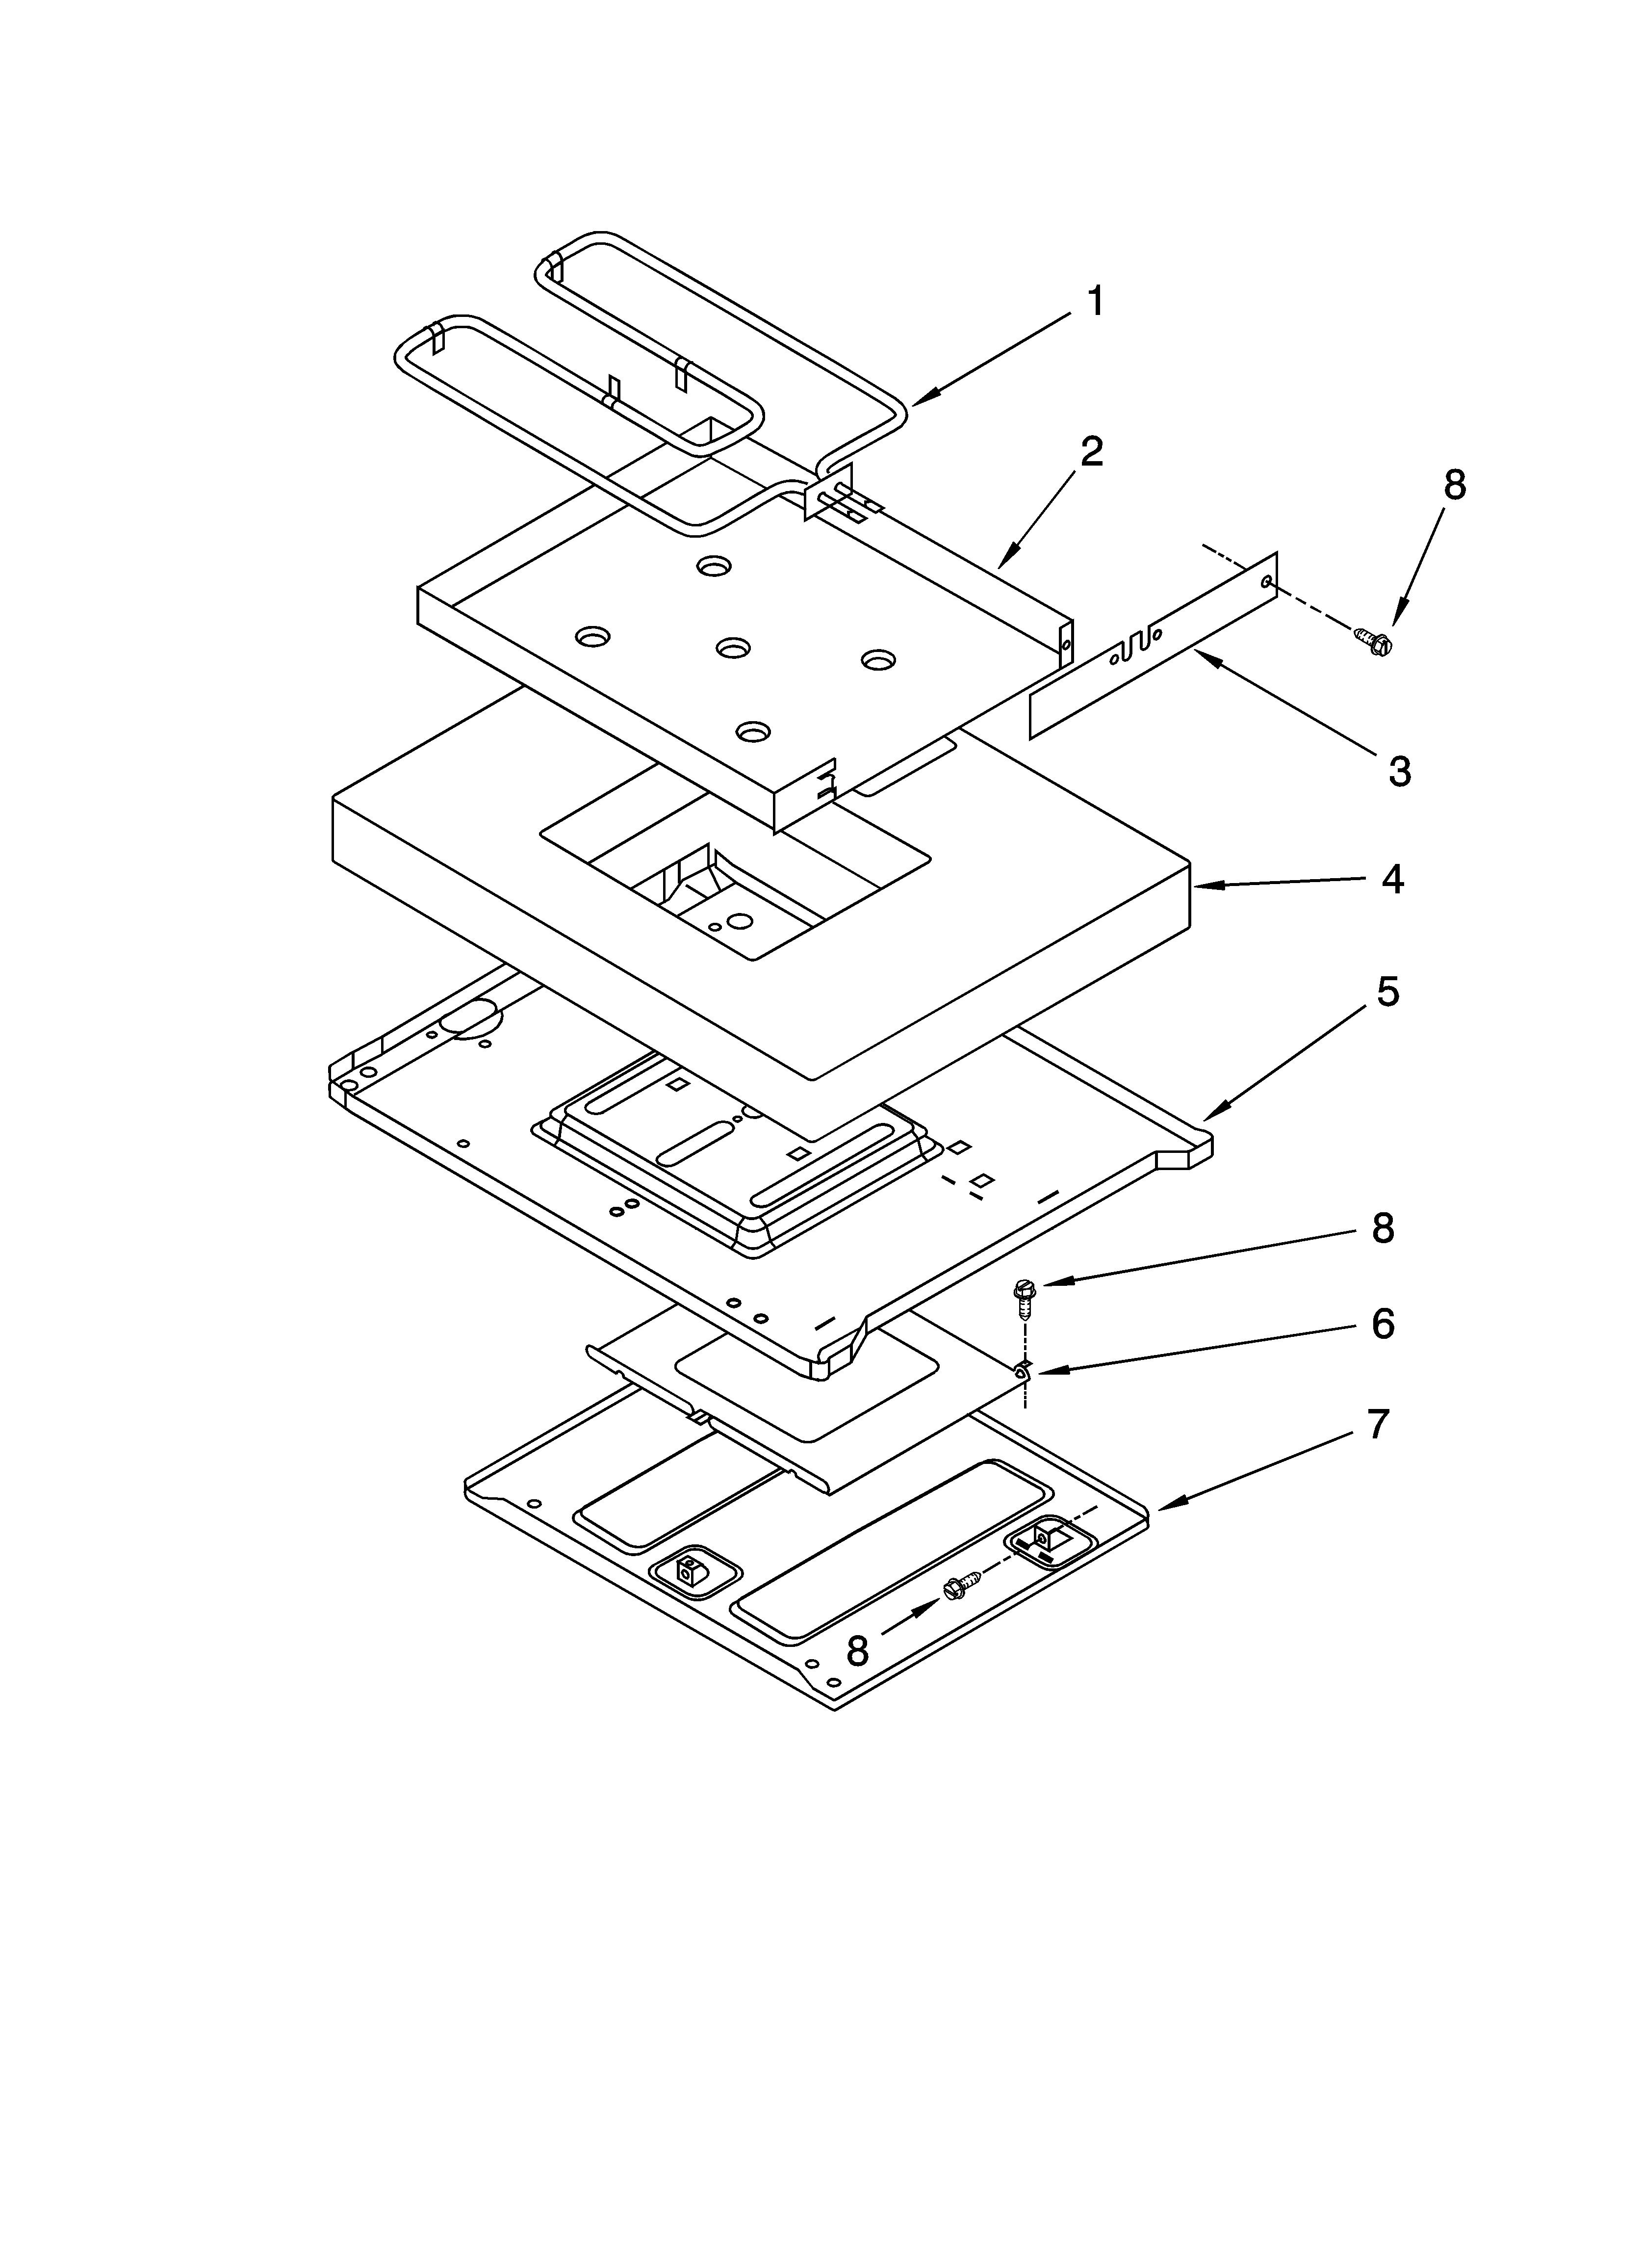 300 Dishwasher Parts Diagram On Whirlpool Heat Pump Wiring Diagram